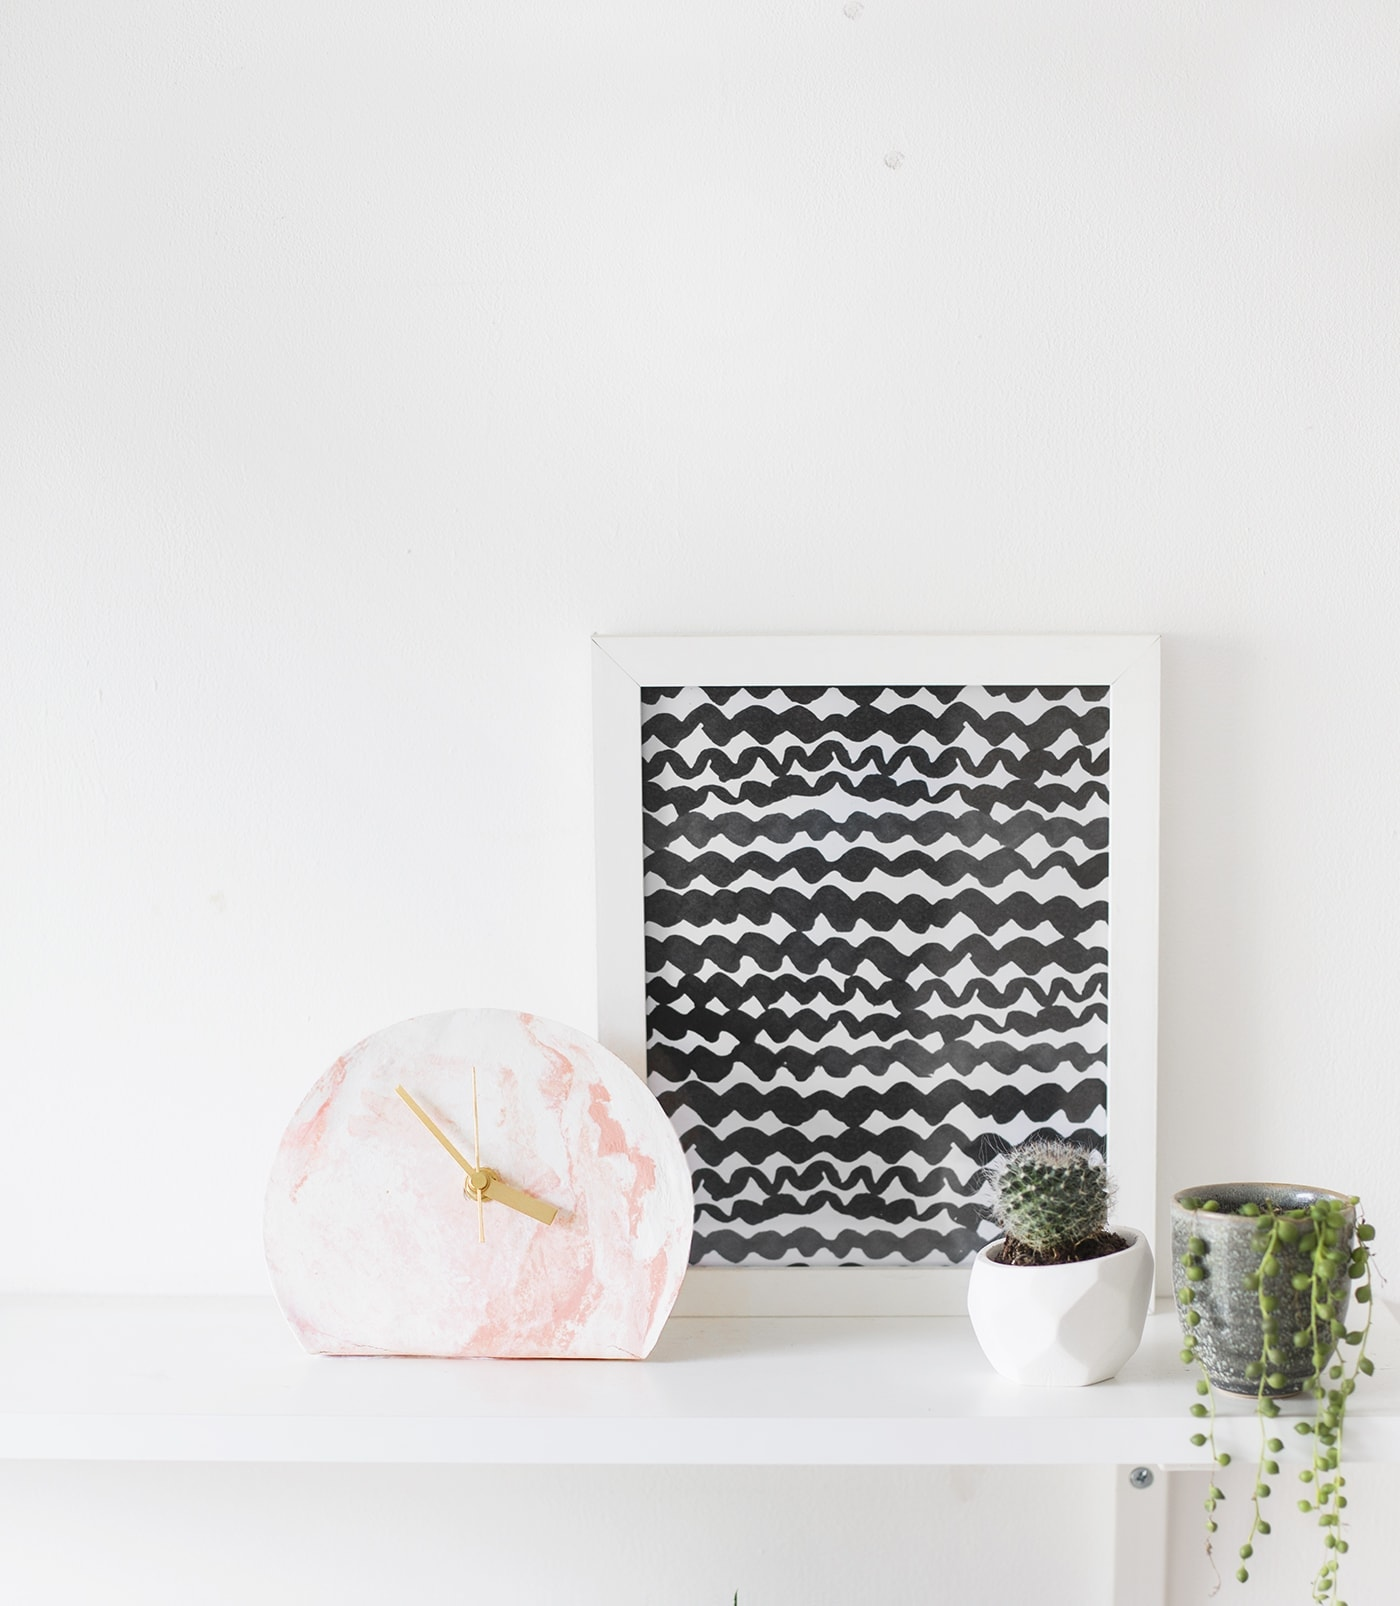 mini standing desk clock DIY | easy tutorial | polymer clay | workspace